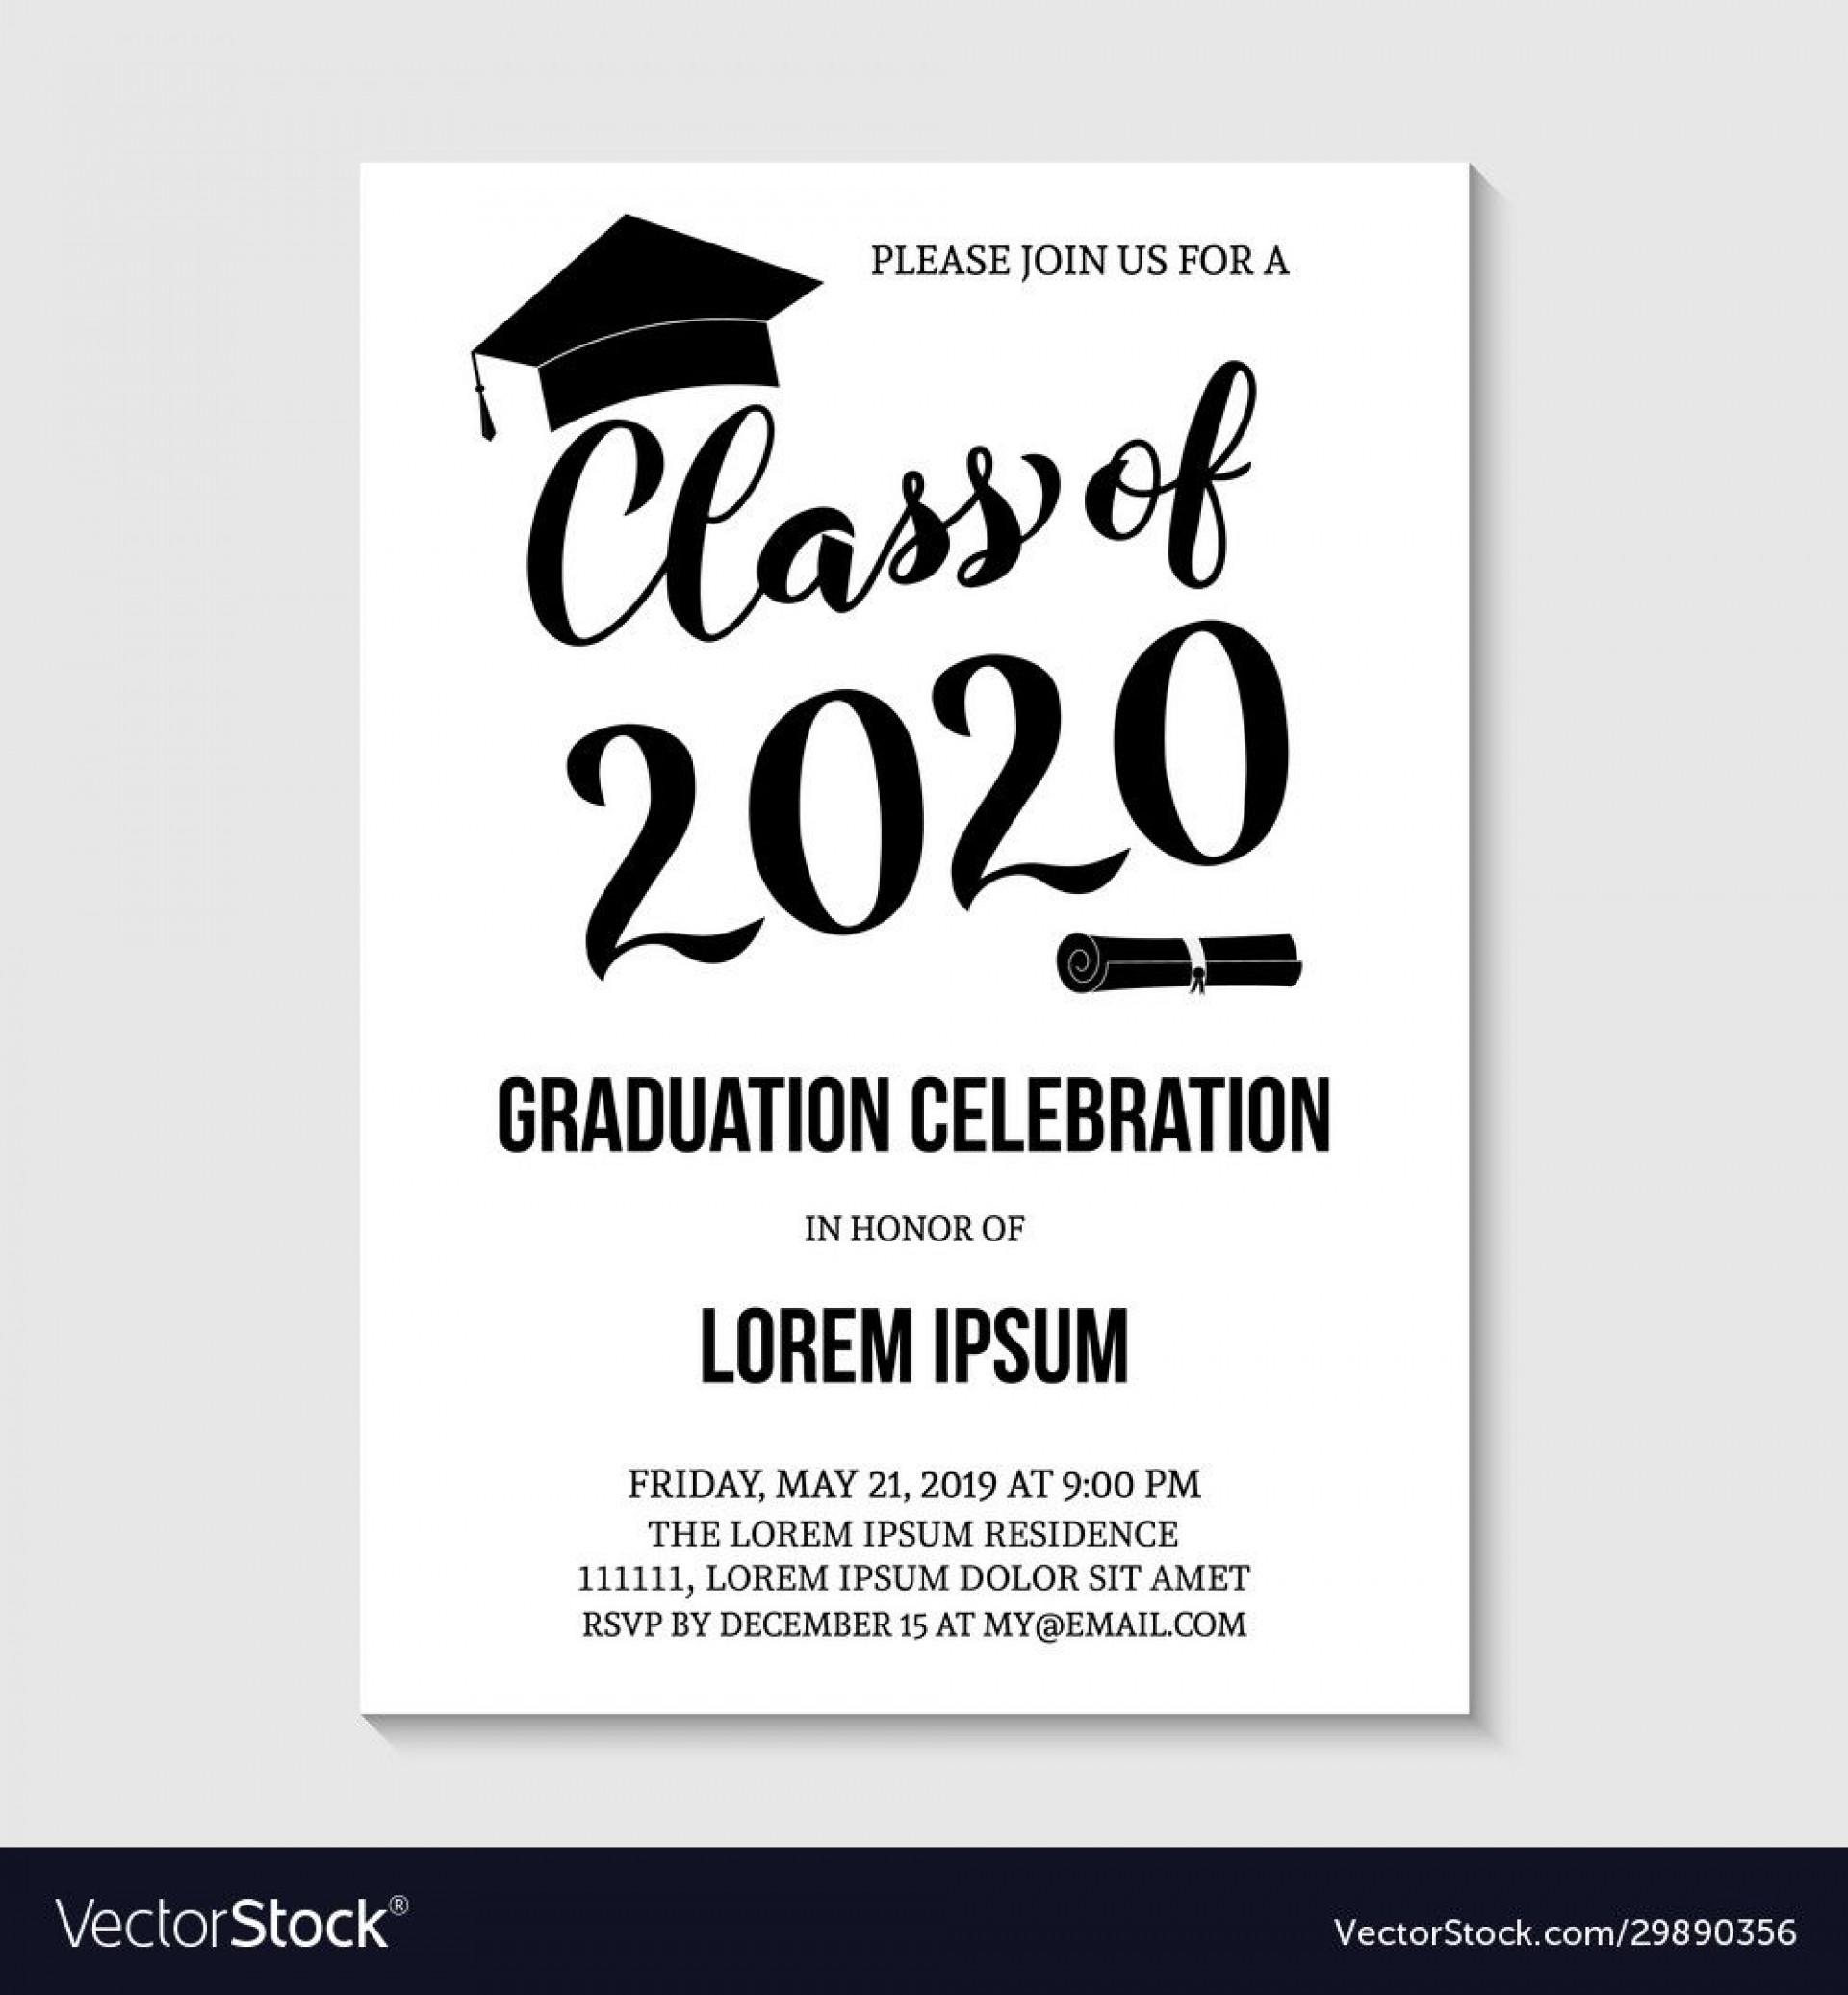 007 Unforgettable Graduation Party Invitation Template Concept  Templates 4 Per Page Free Reception1920